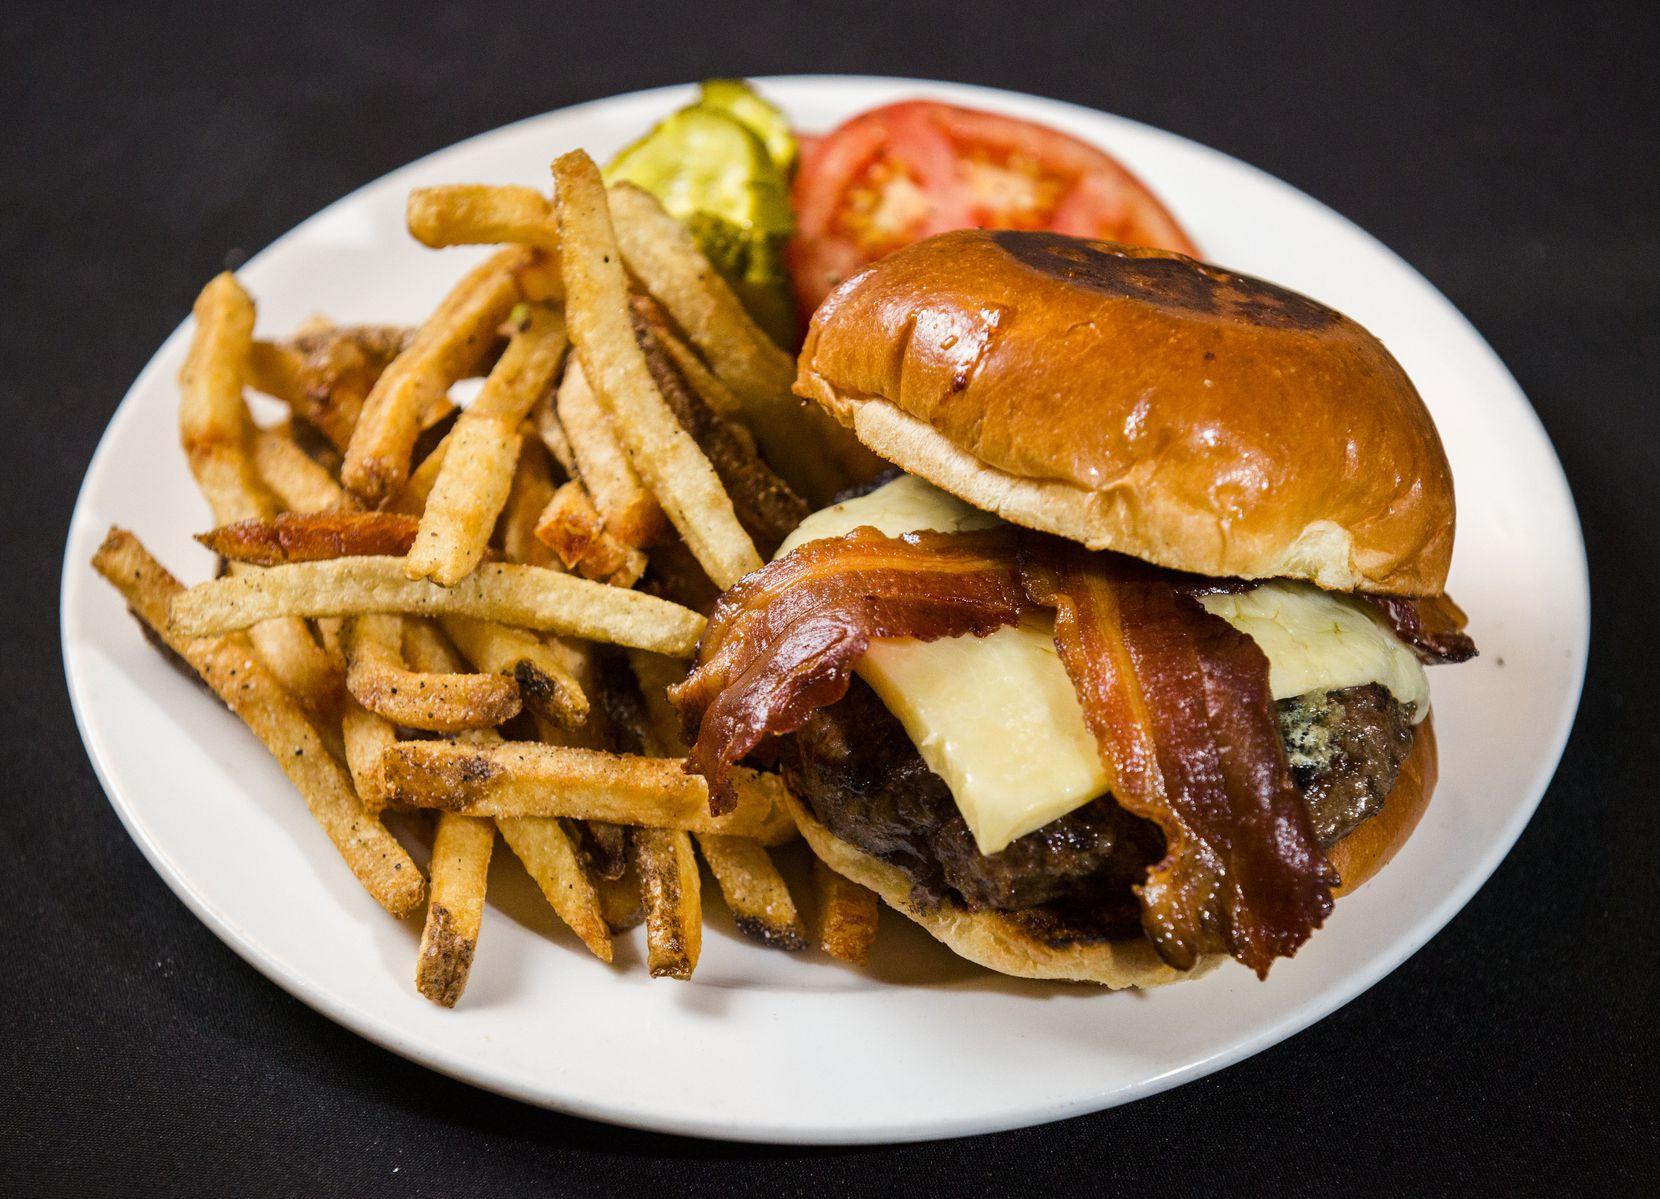 The famous burger